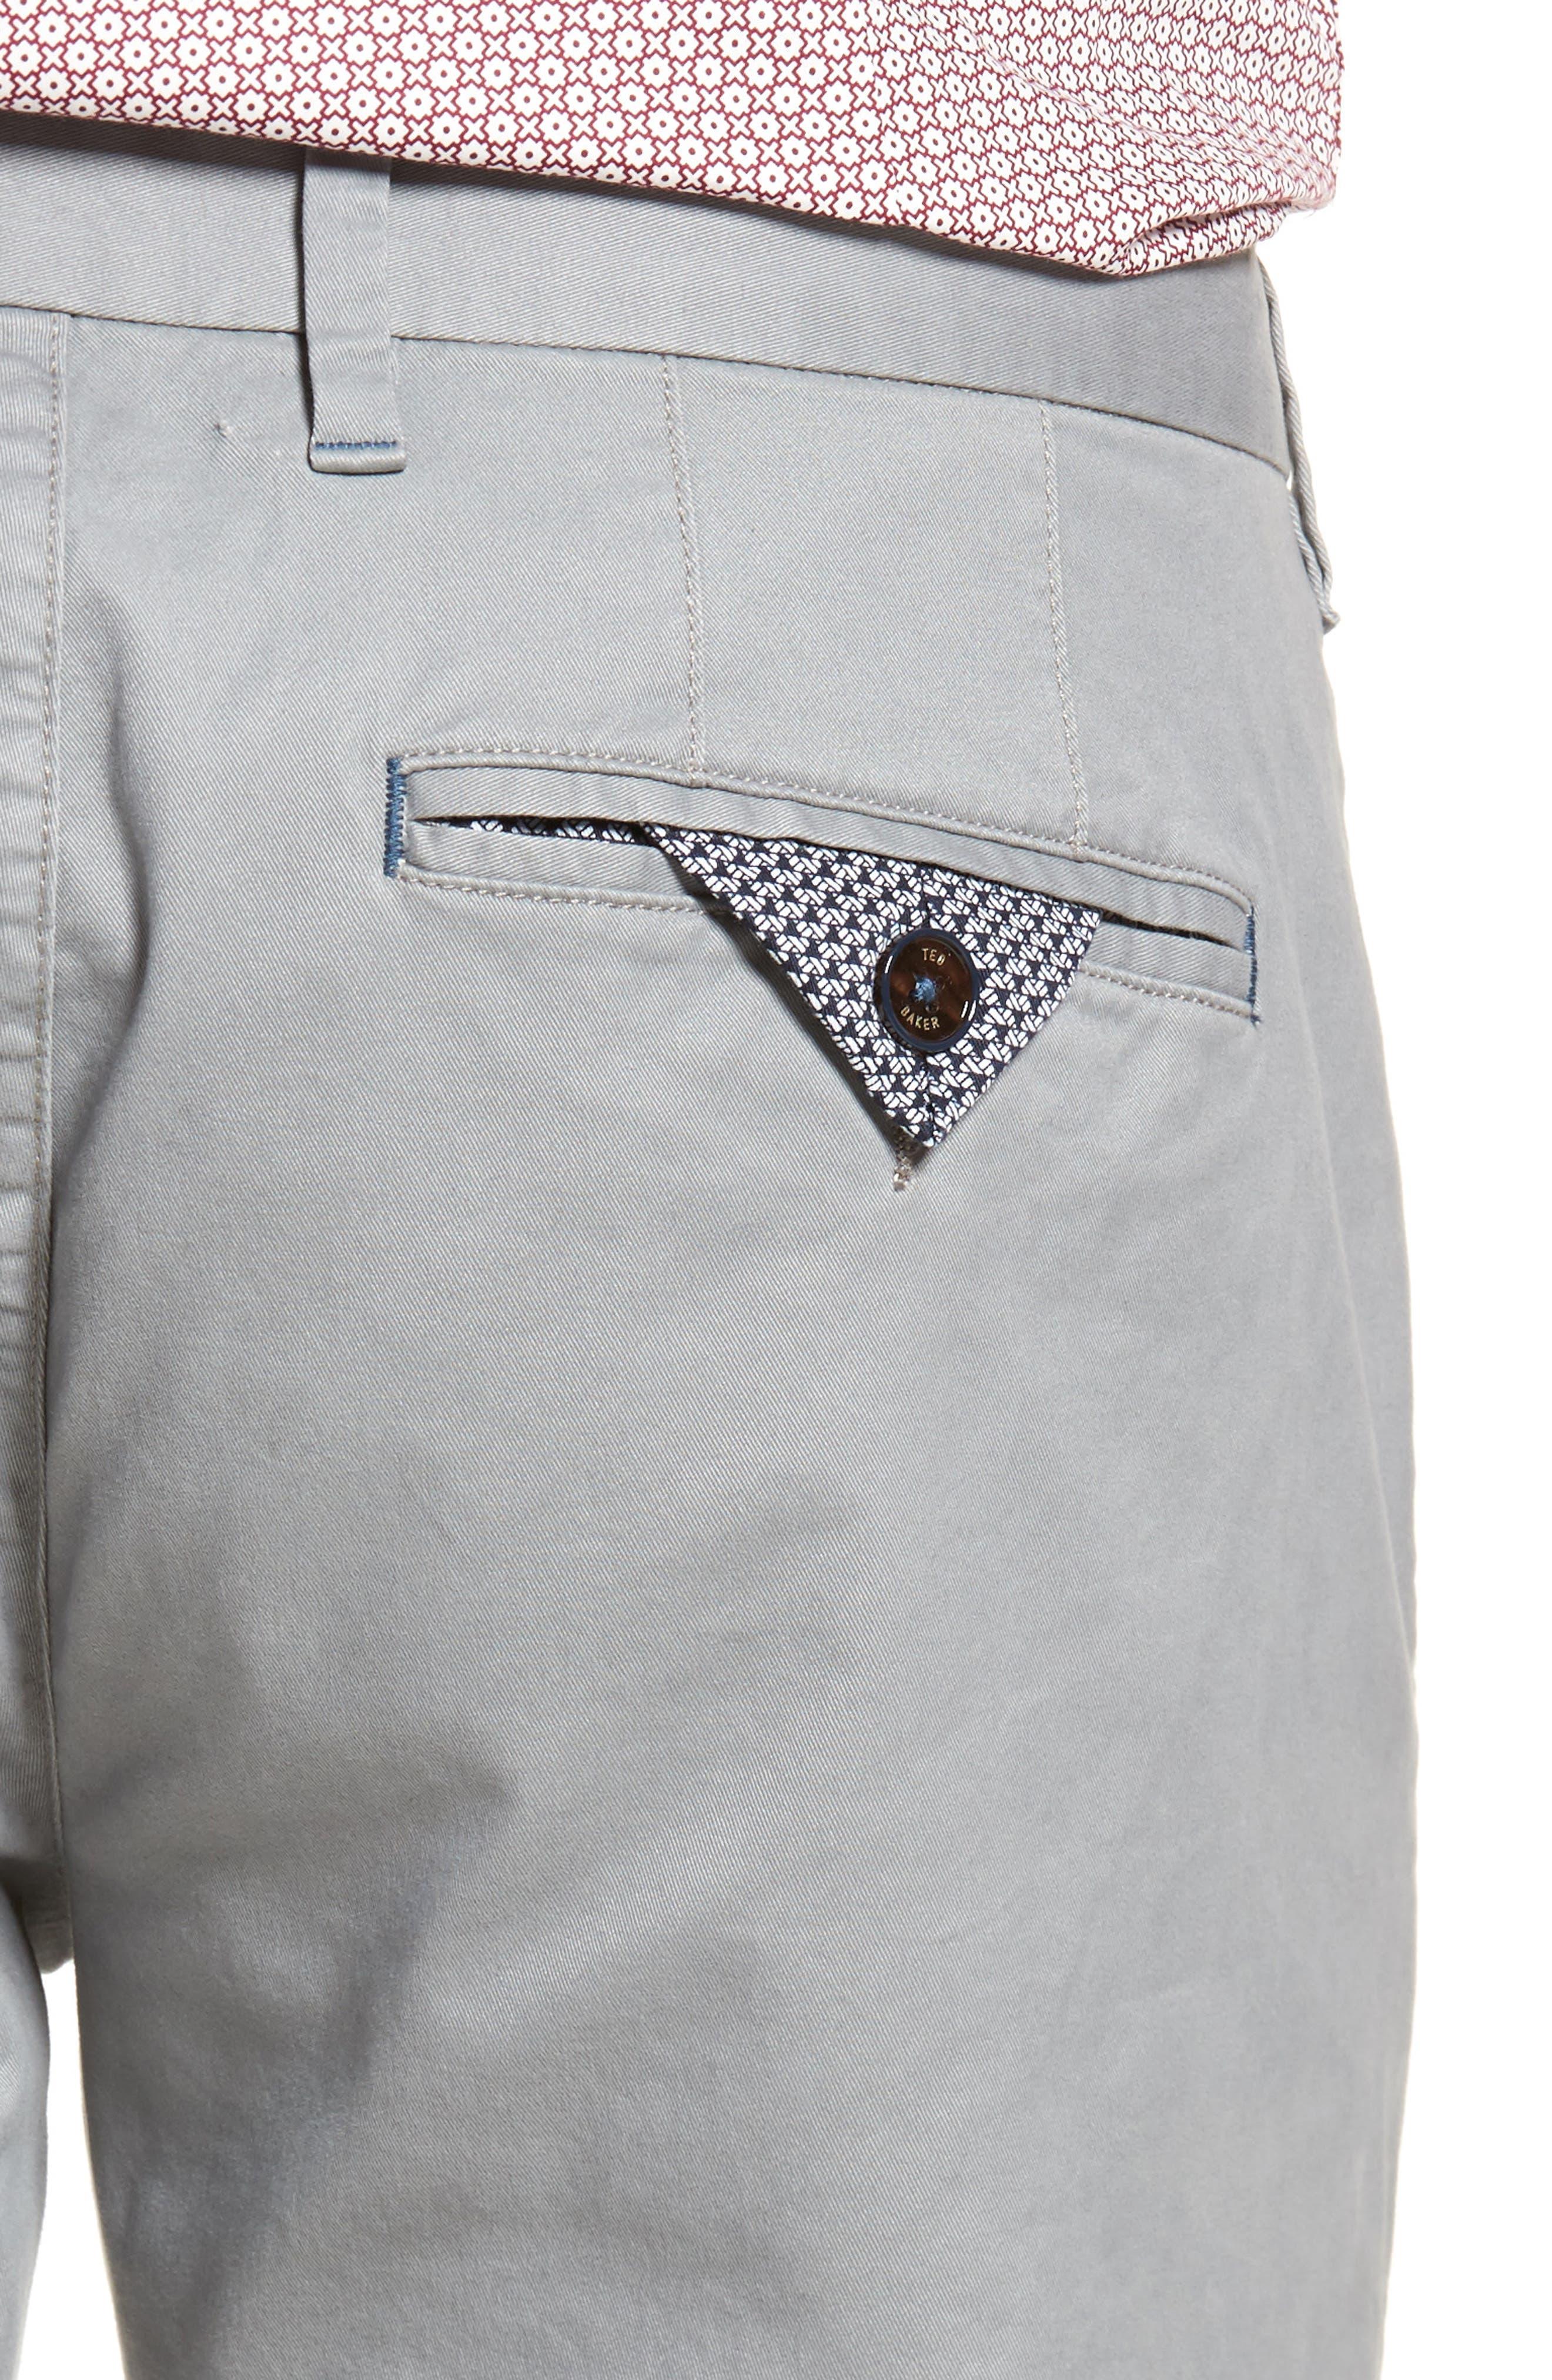 Procor Slim Fit Chino Pants,                             Alternate thumbnail 4, color,                             050